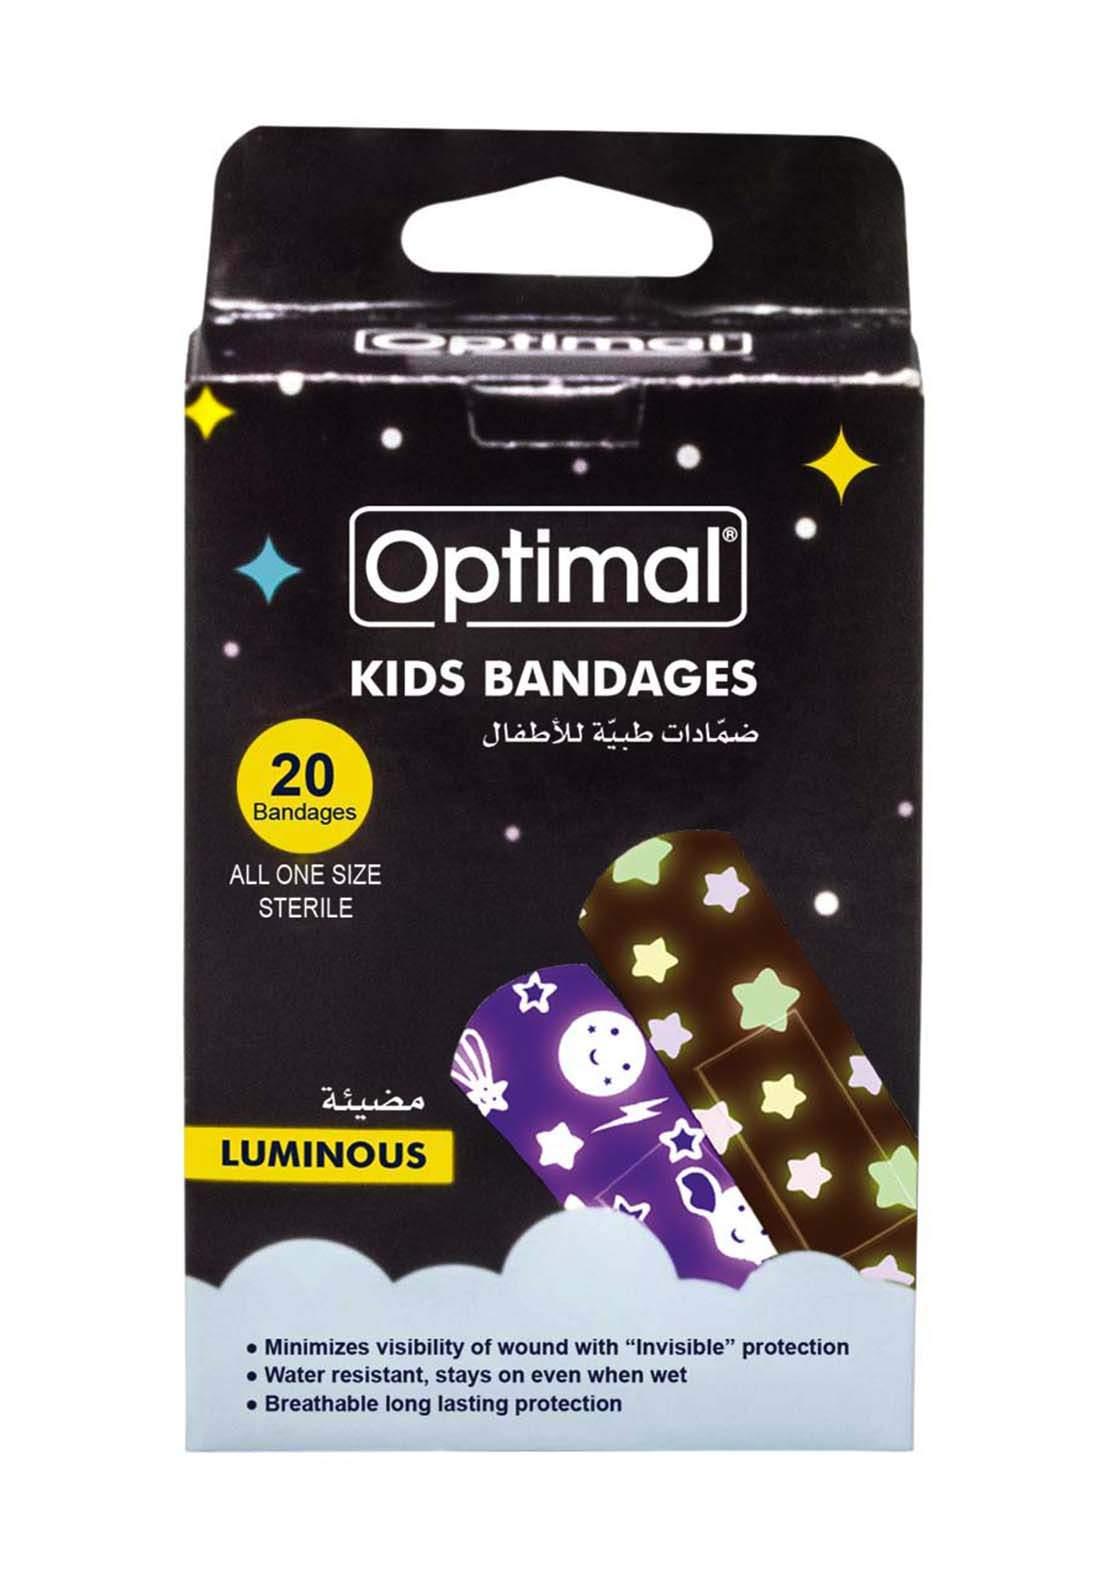 Optimal Luminous Kids Bandages  لصقات جروح مضيئة للأطفال